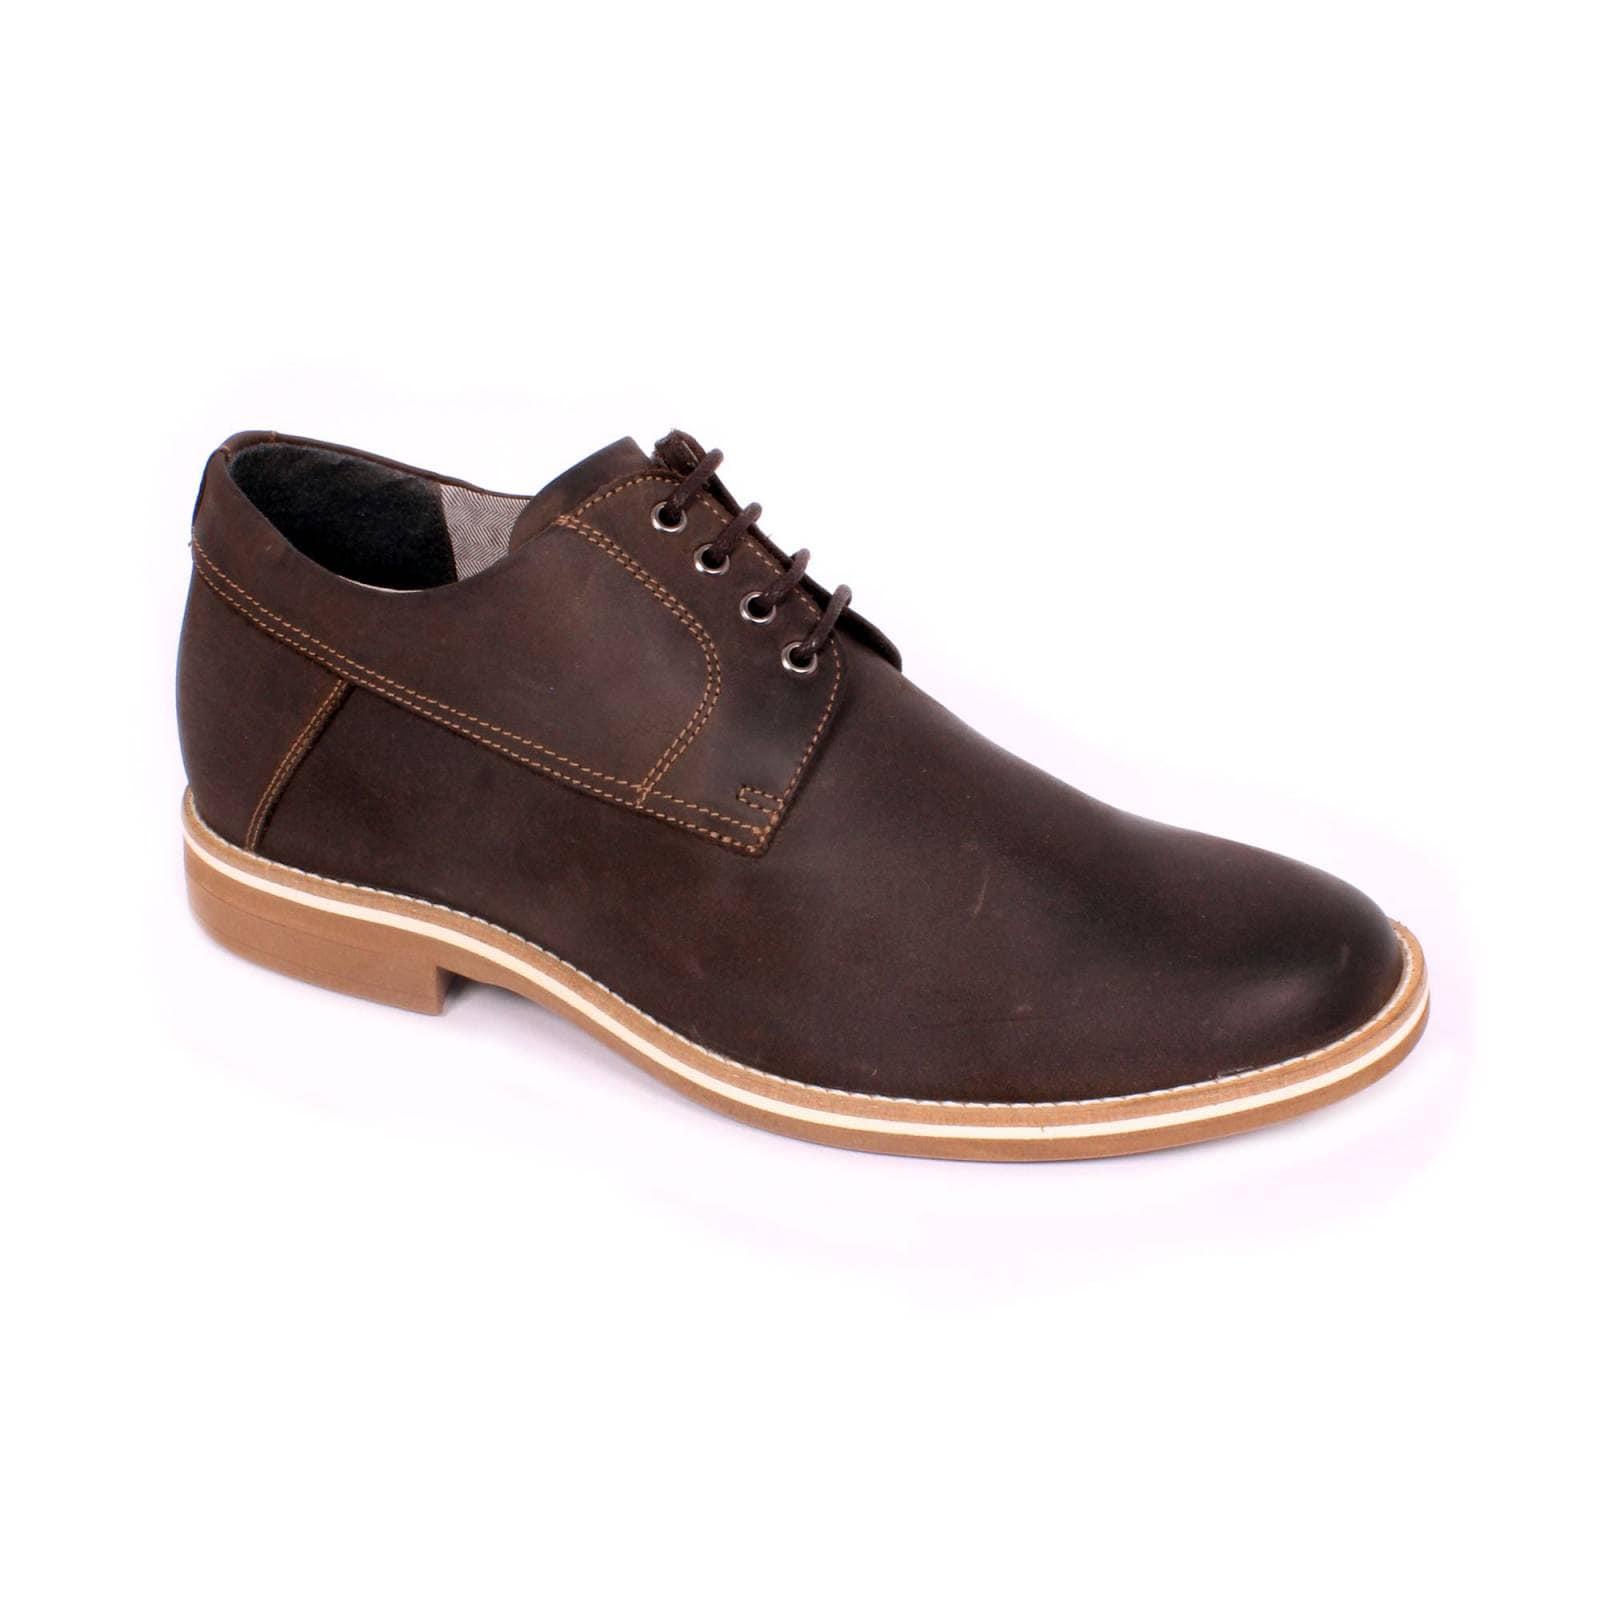 Zapato Casual Culture Café Max Denegri +7cms De Altura